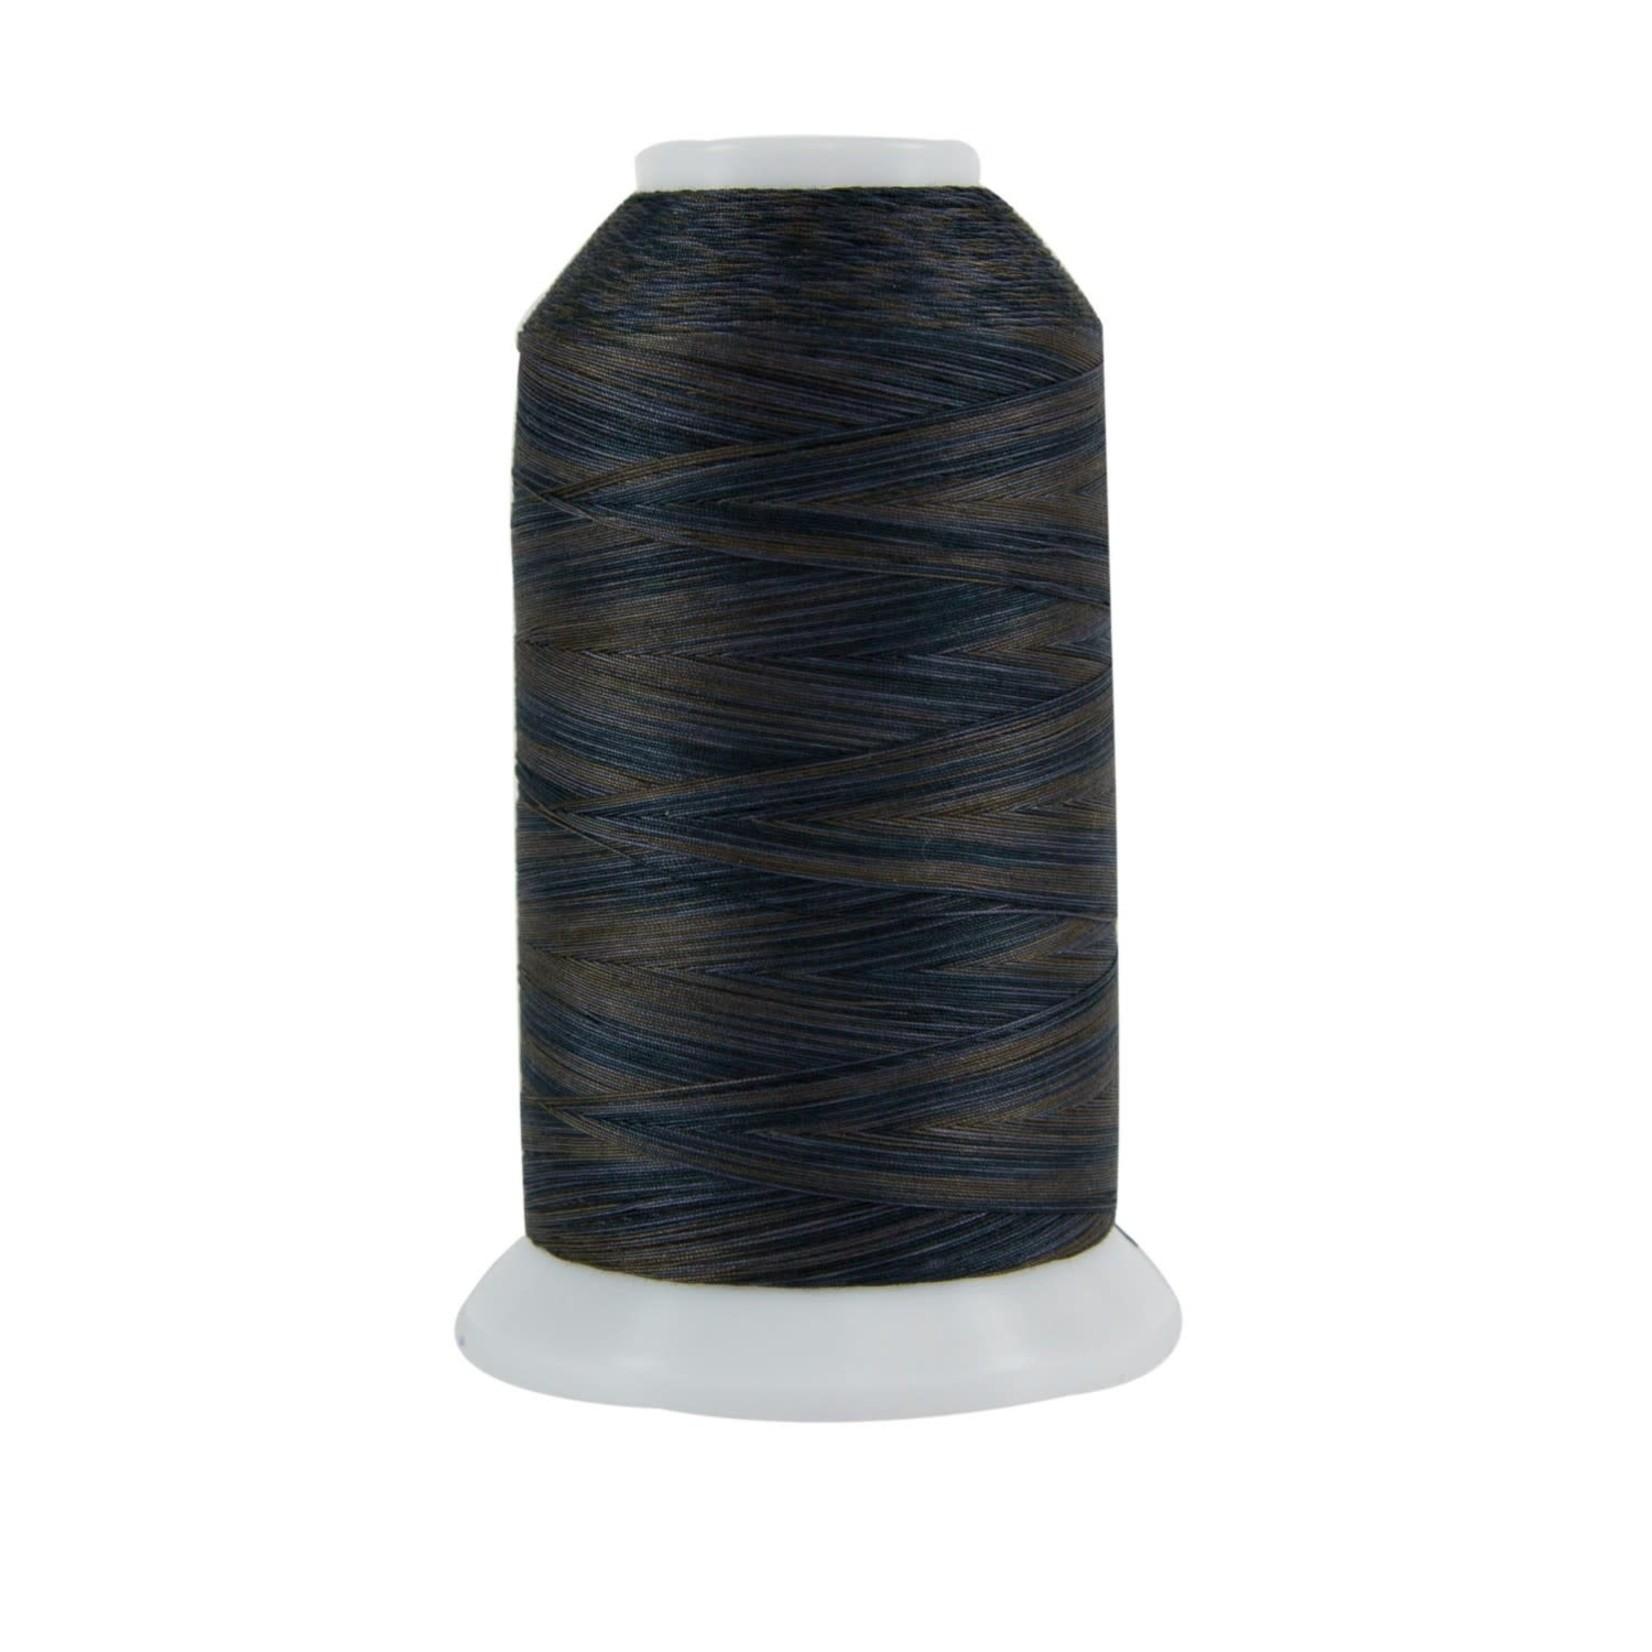 Superior Threads King Tut - #40 - 1828 m - 0979 Obsidian